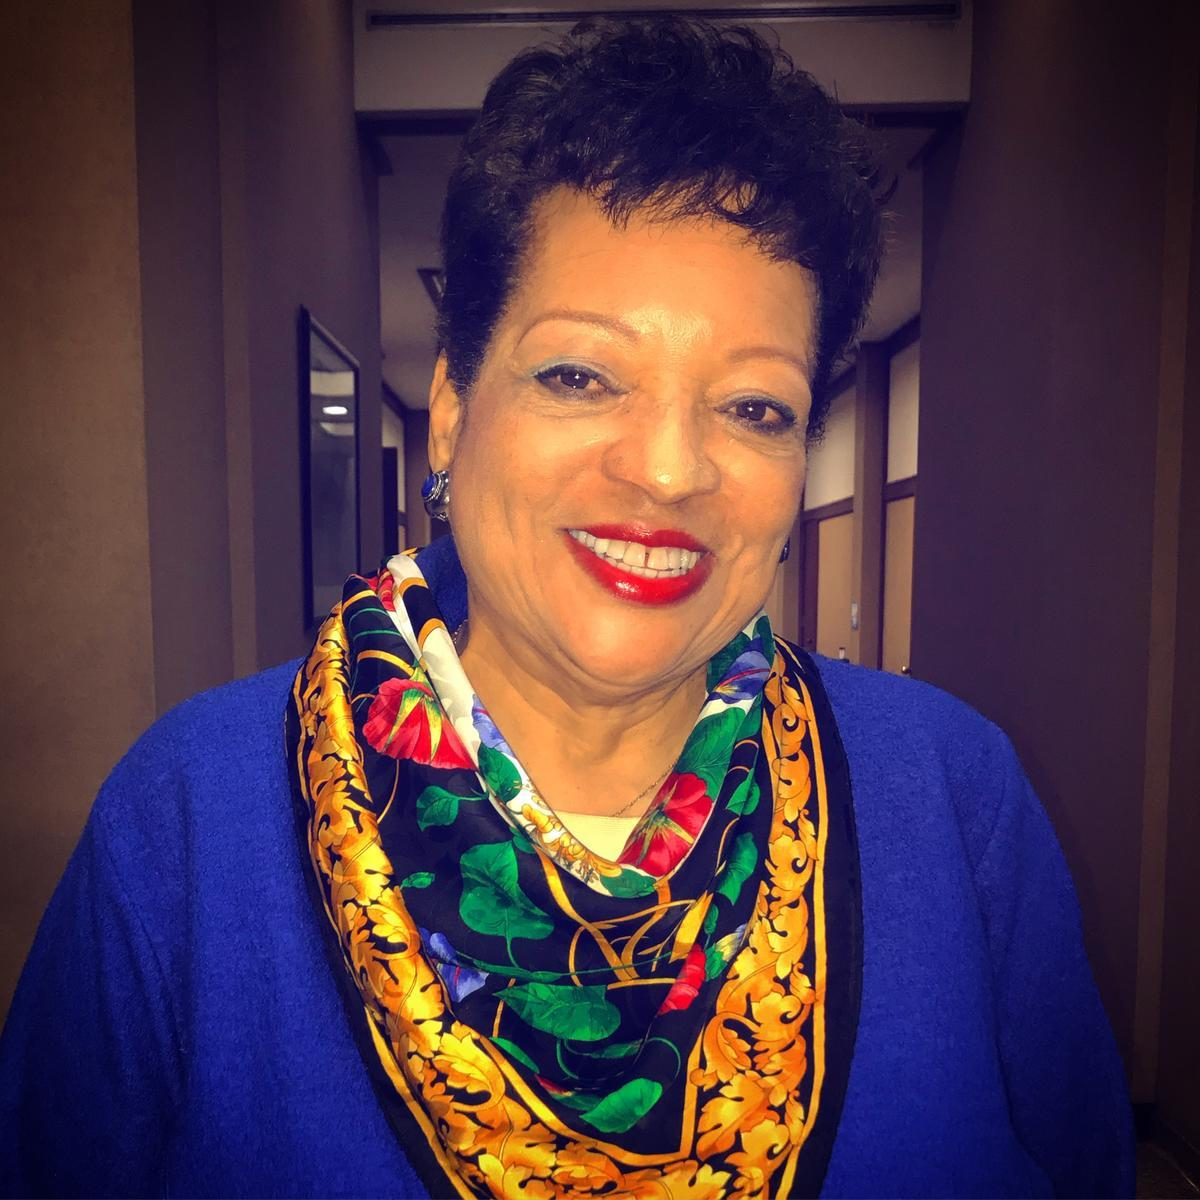 headshot of staff diversity director sidalia reel smiling